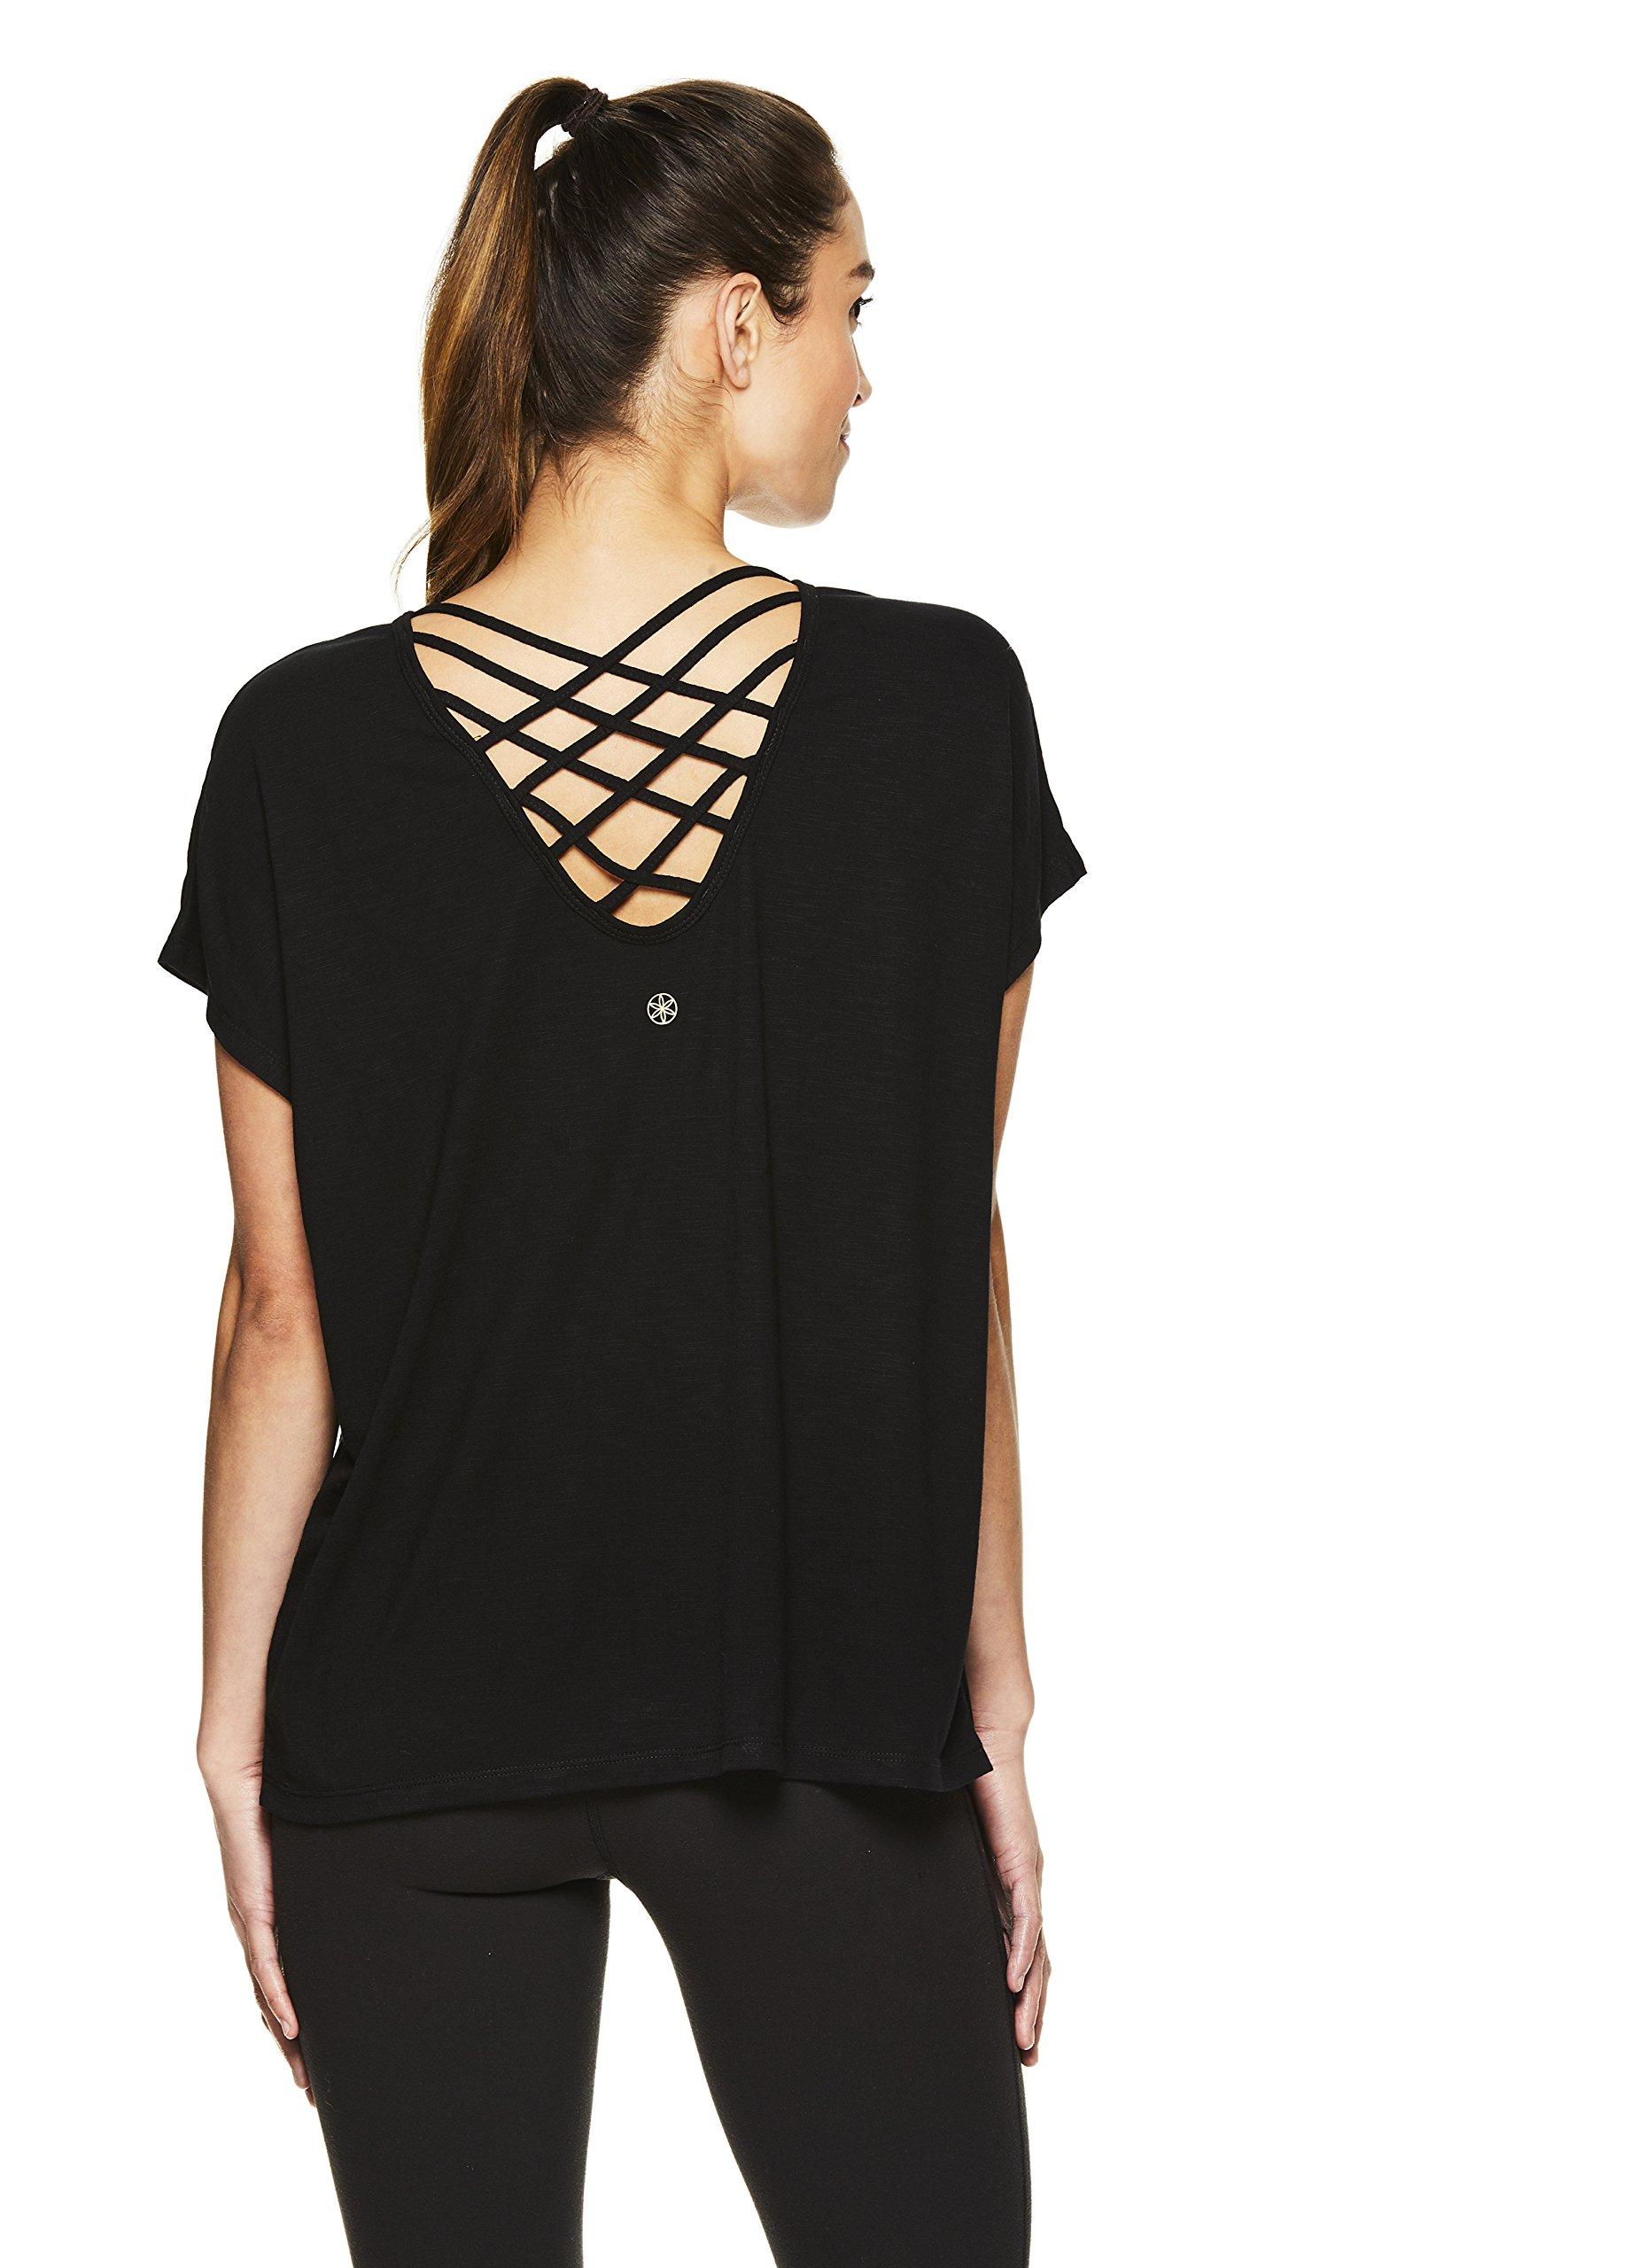 Gaiam Women's Short Sleeve Open Back Yoga T Shirt - Relaxed Fit Workout & Training Top - Black (Tap Shoe), 2X